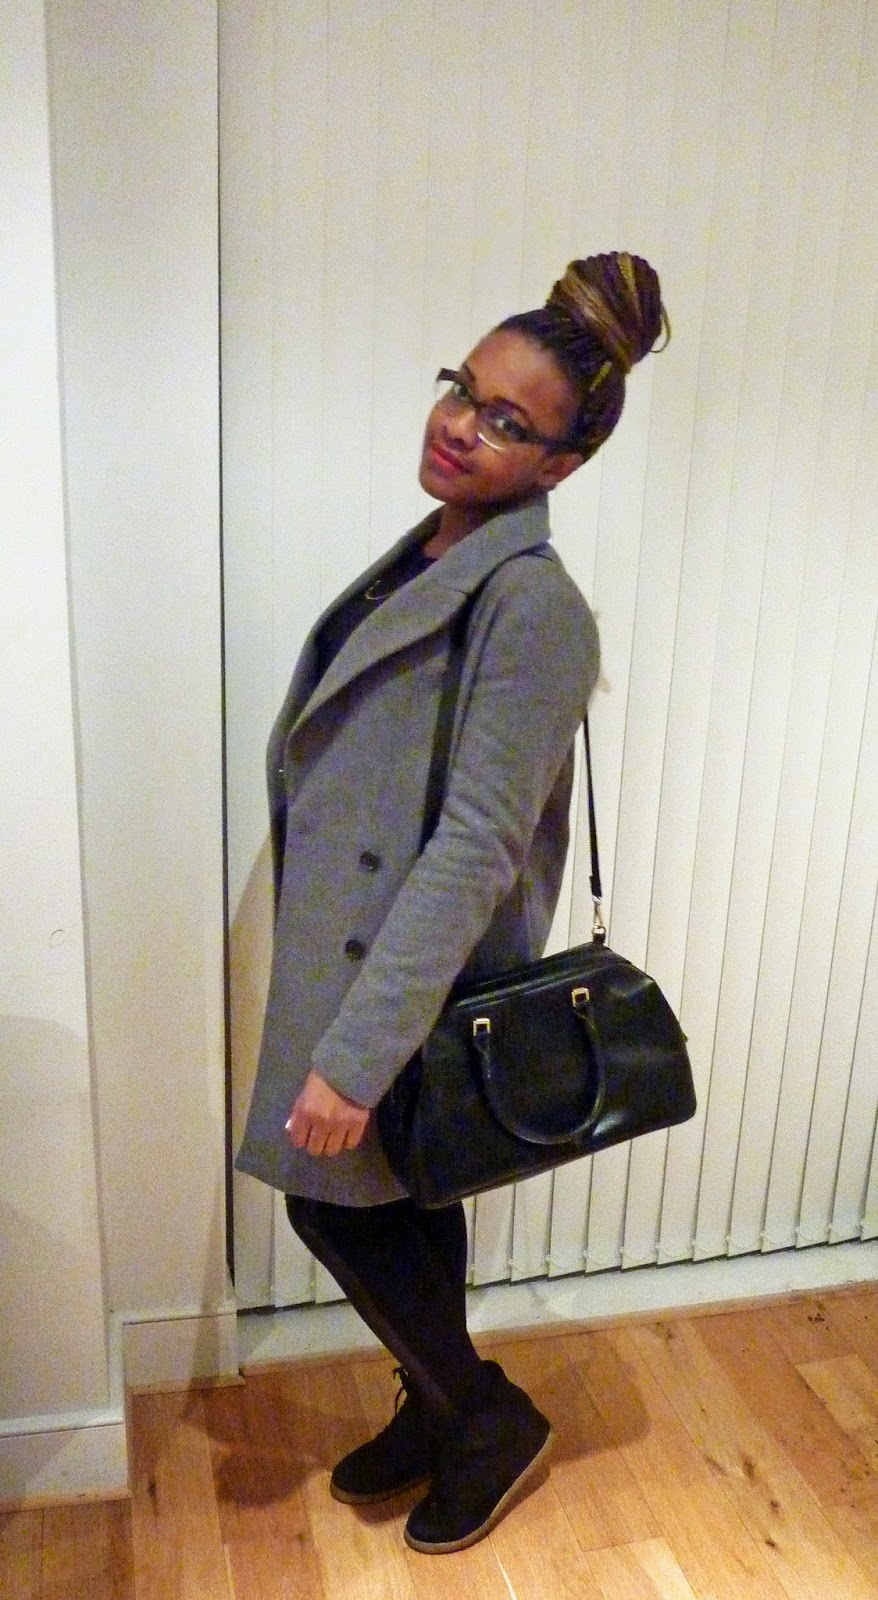 Zara Double Breasted Wool Grey Coat H&M Leather Panel Leggings Treggings Topshop Wedge Trainers